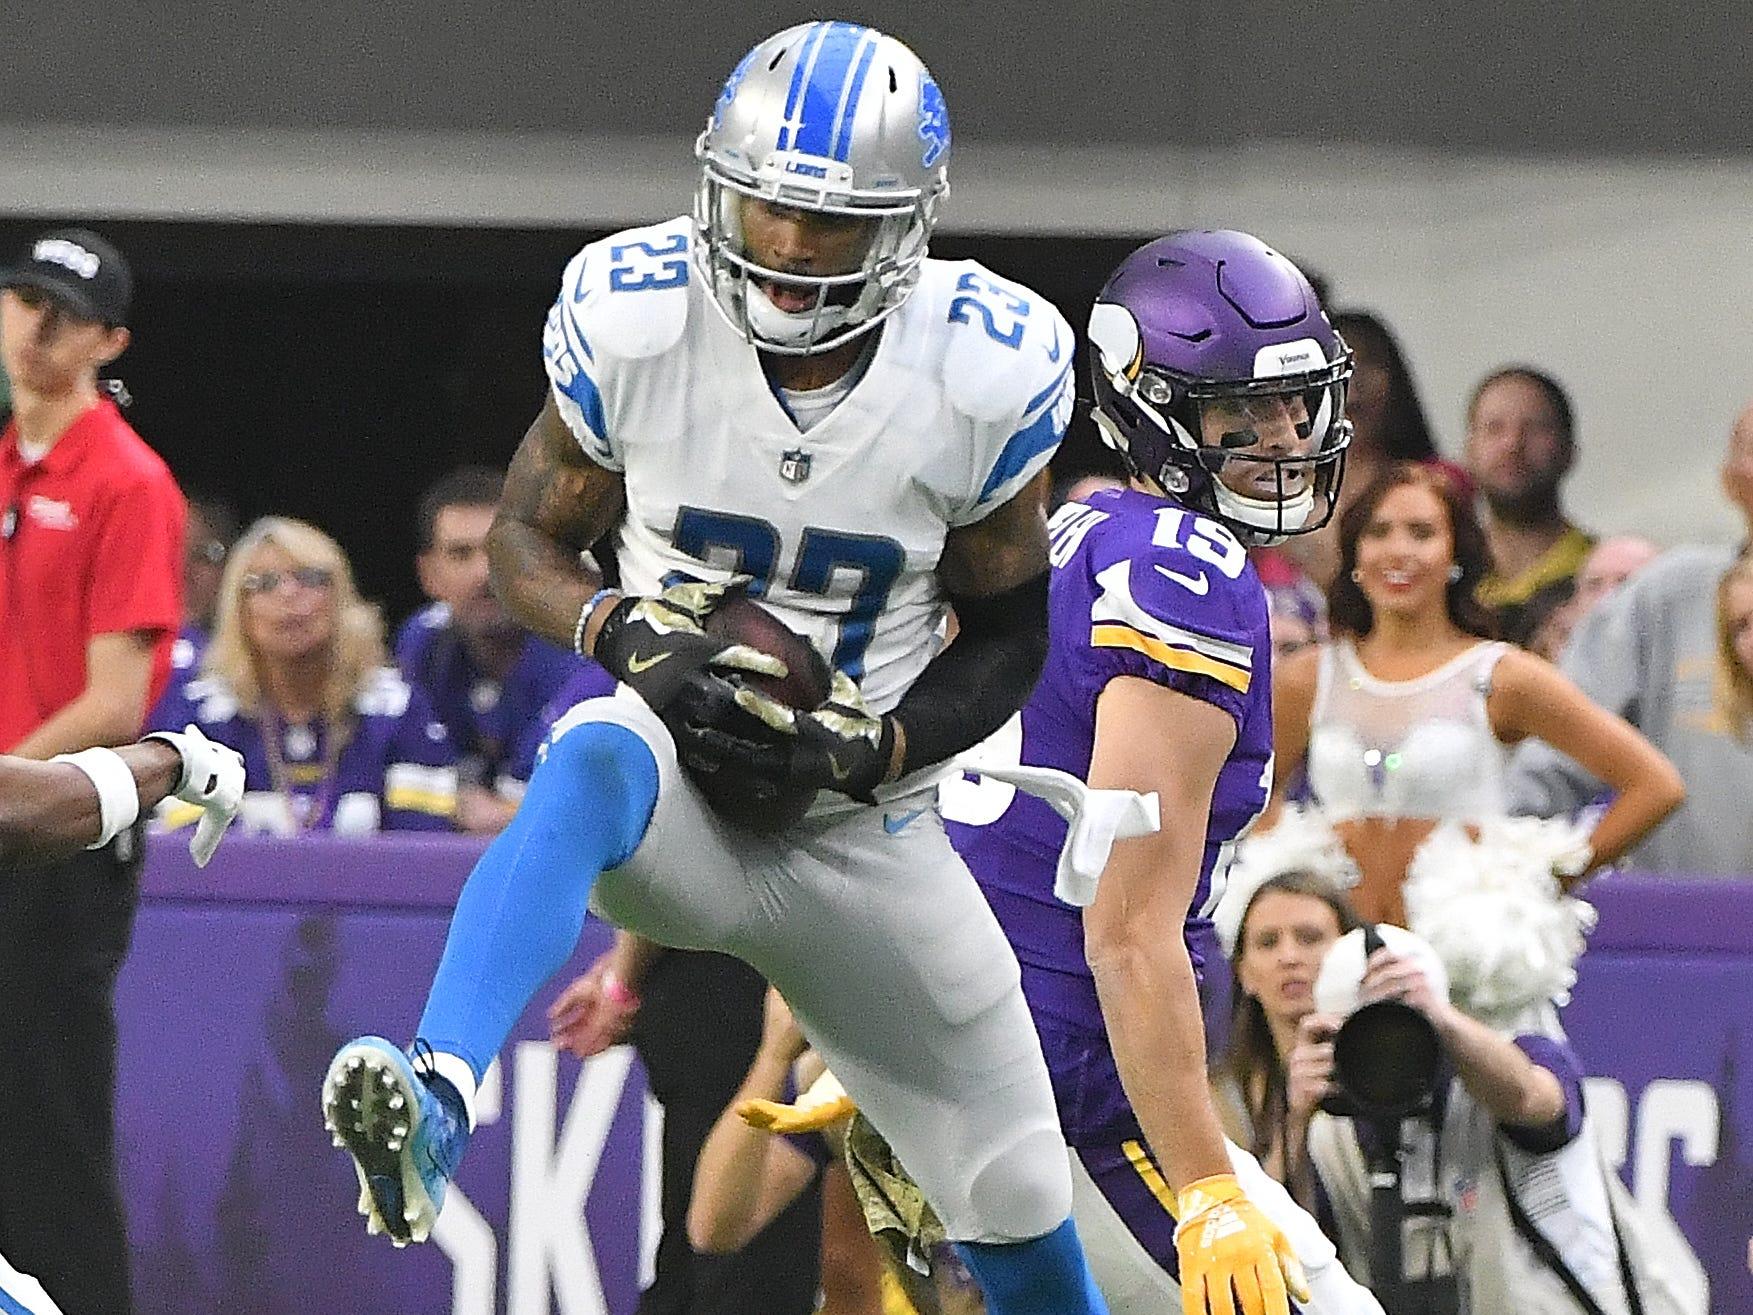 Lions' Darius Slay pulls down an interception intended for Vikings' Adam Thielen in the second quarter. NFL Detroit Lions vs. Minnesota Vikings at U.S. Bank Stadium in Minneapolis, Minnesota on November 4, 2018.